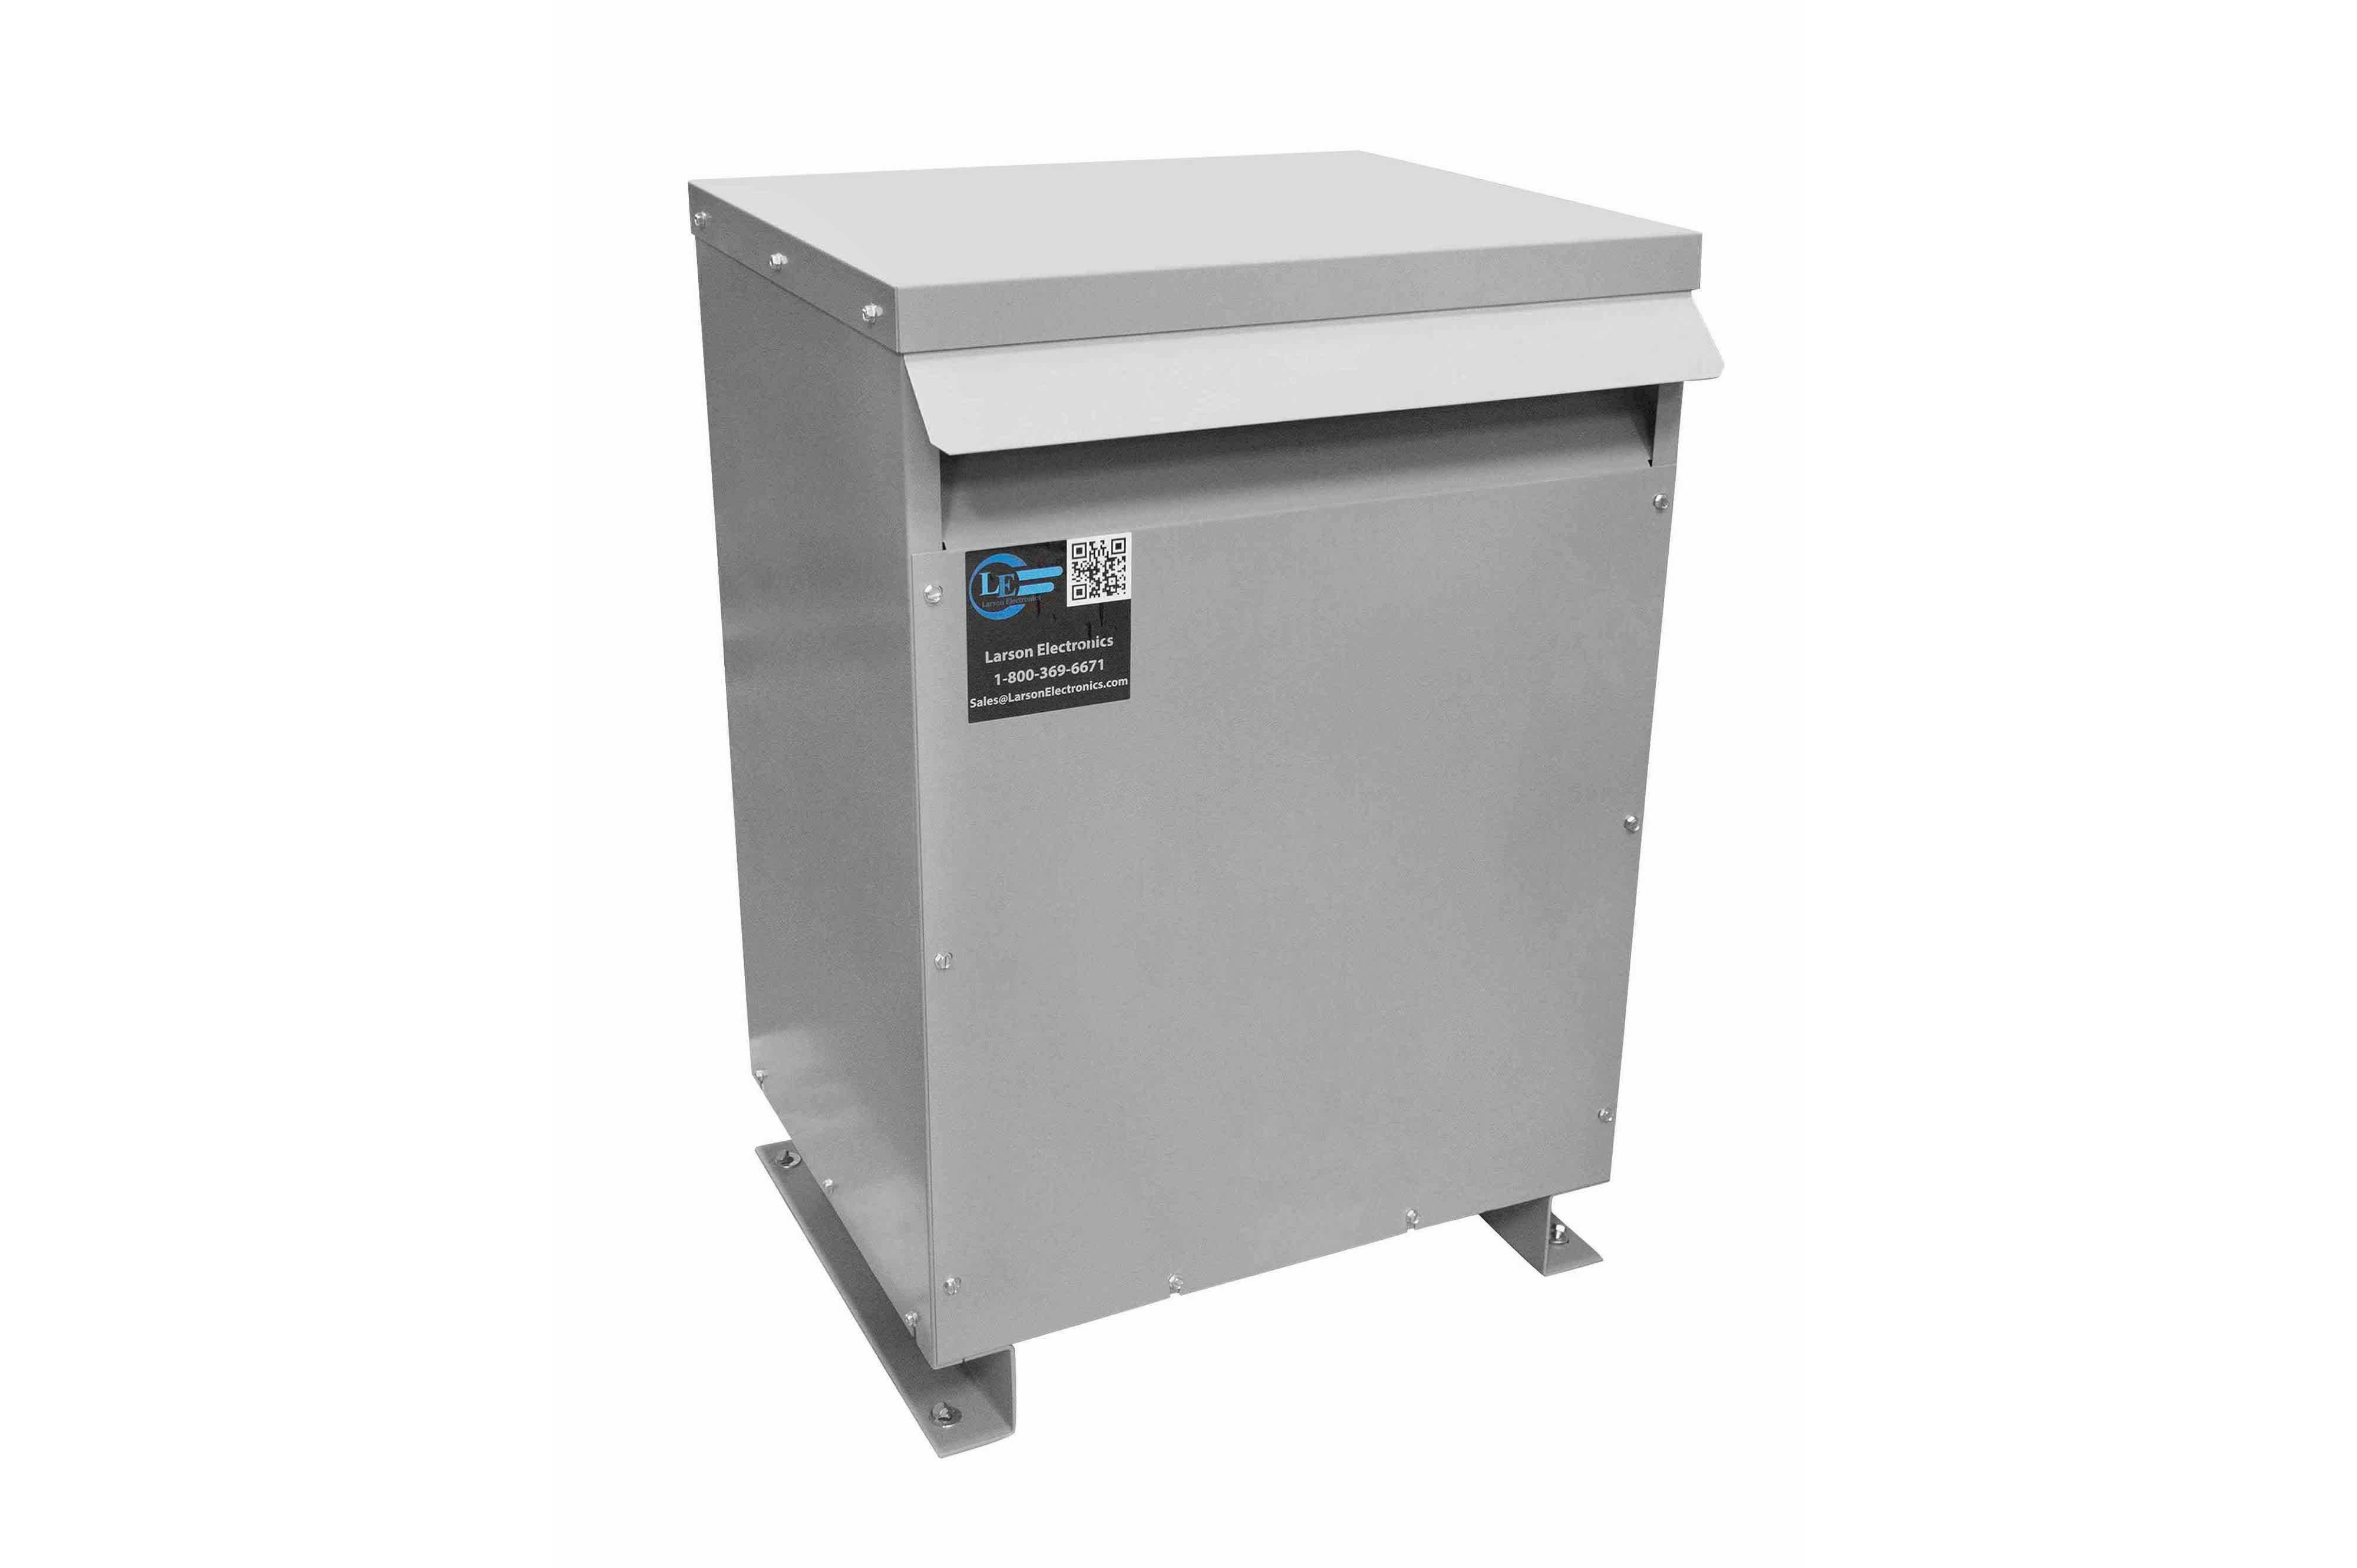 35 kVA 3PH Isolation Transformer, 480V Wye Primary, 575V Delta Secondary, N3R, Ventilated, 60 Hz